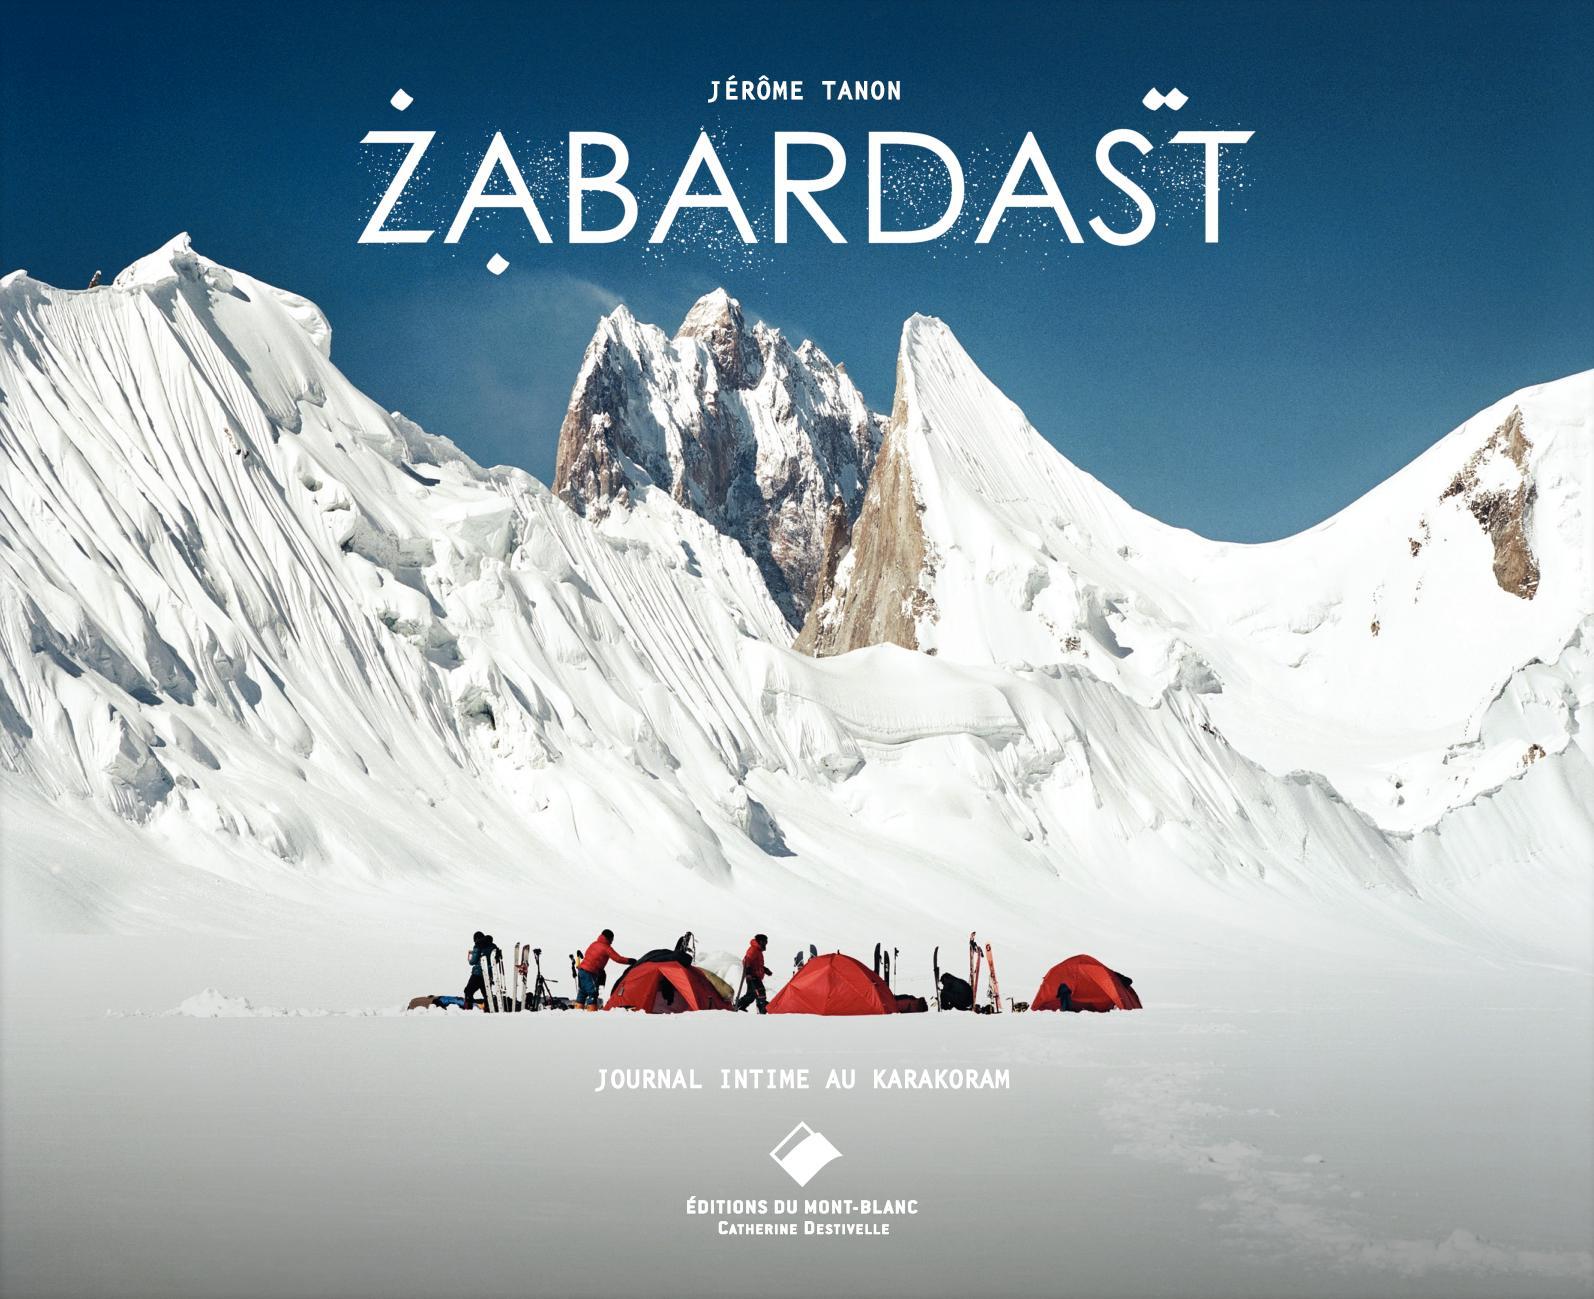 Zabardast: une aventure humaine sans concession